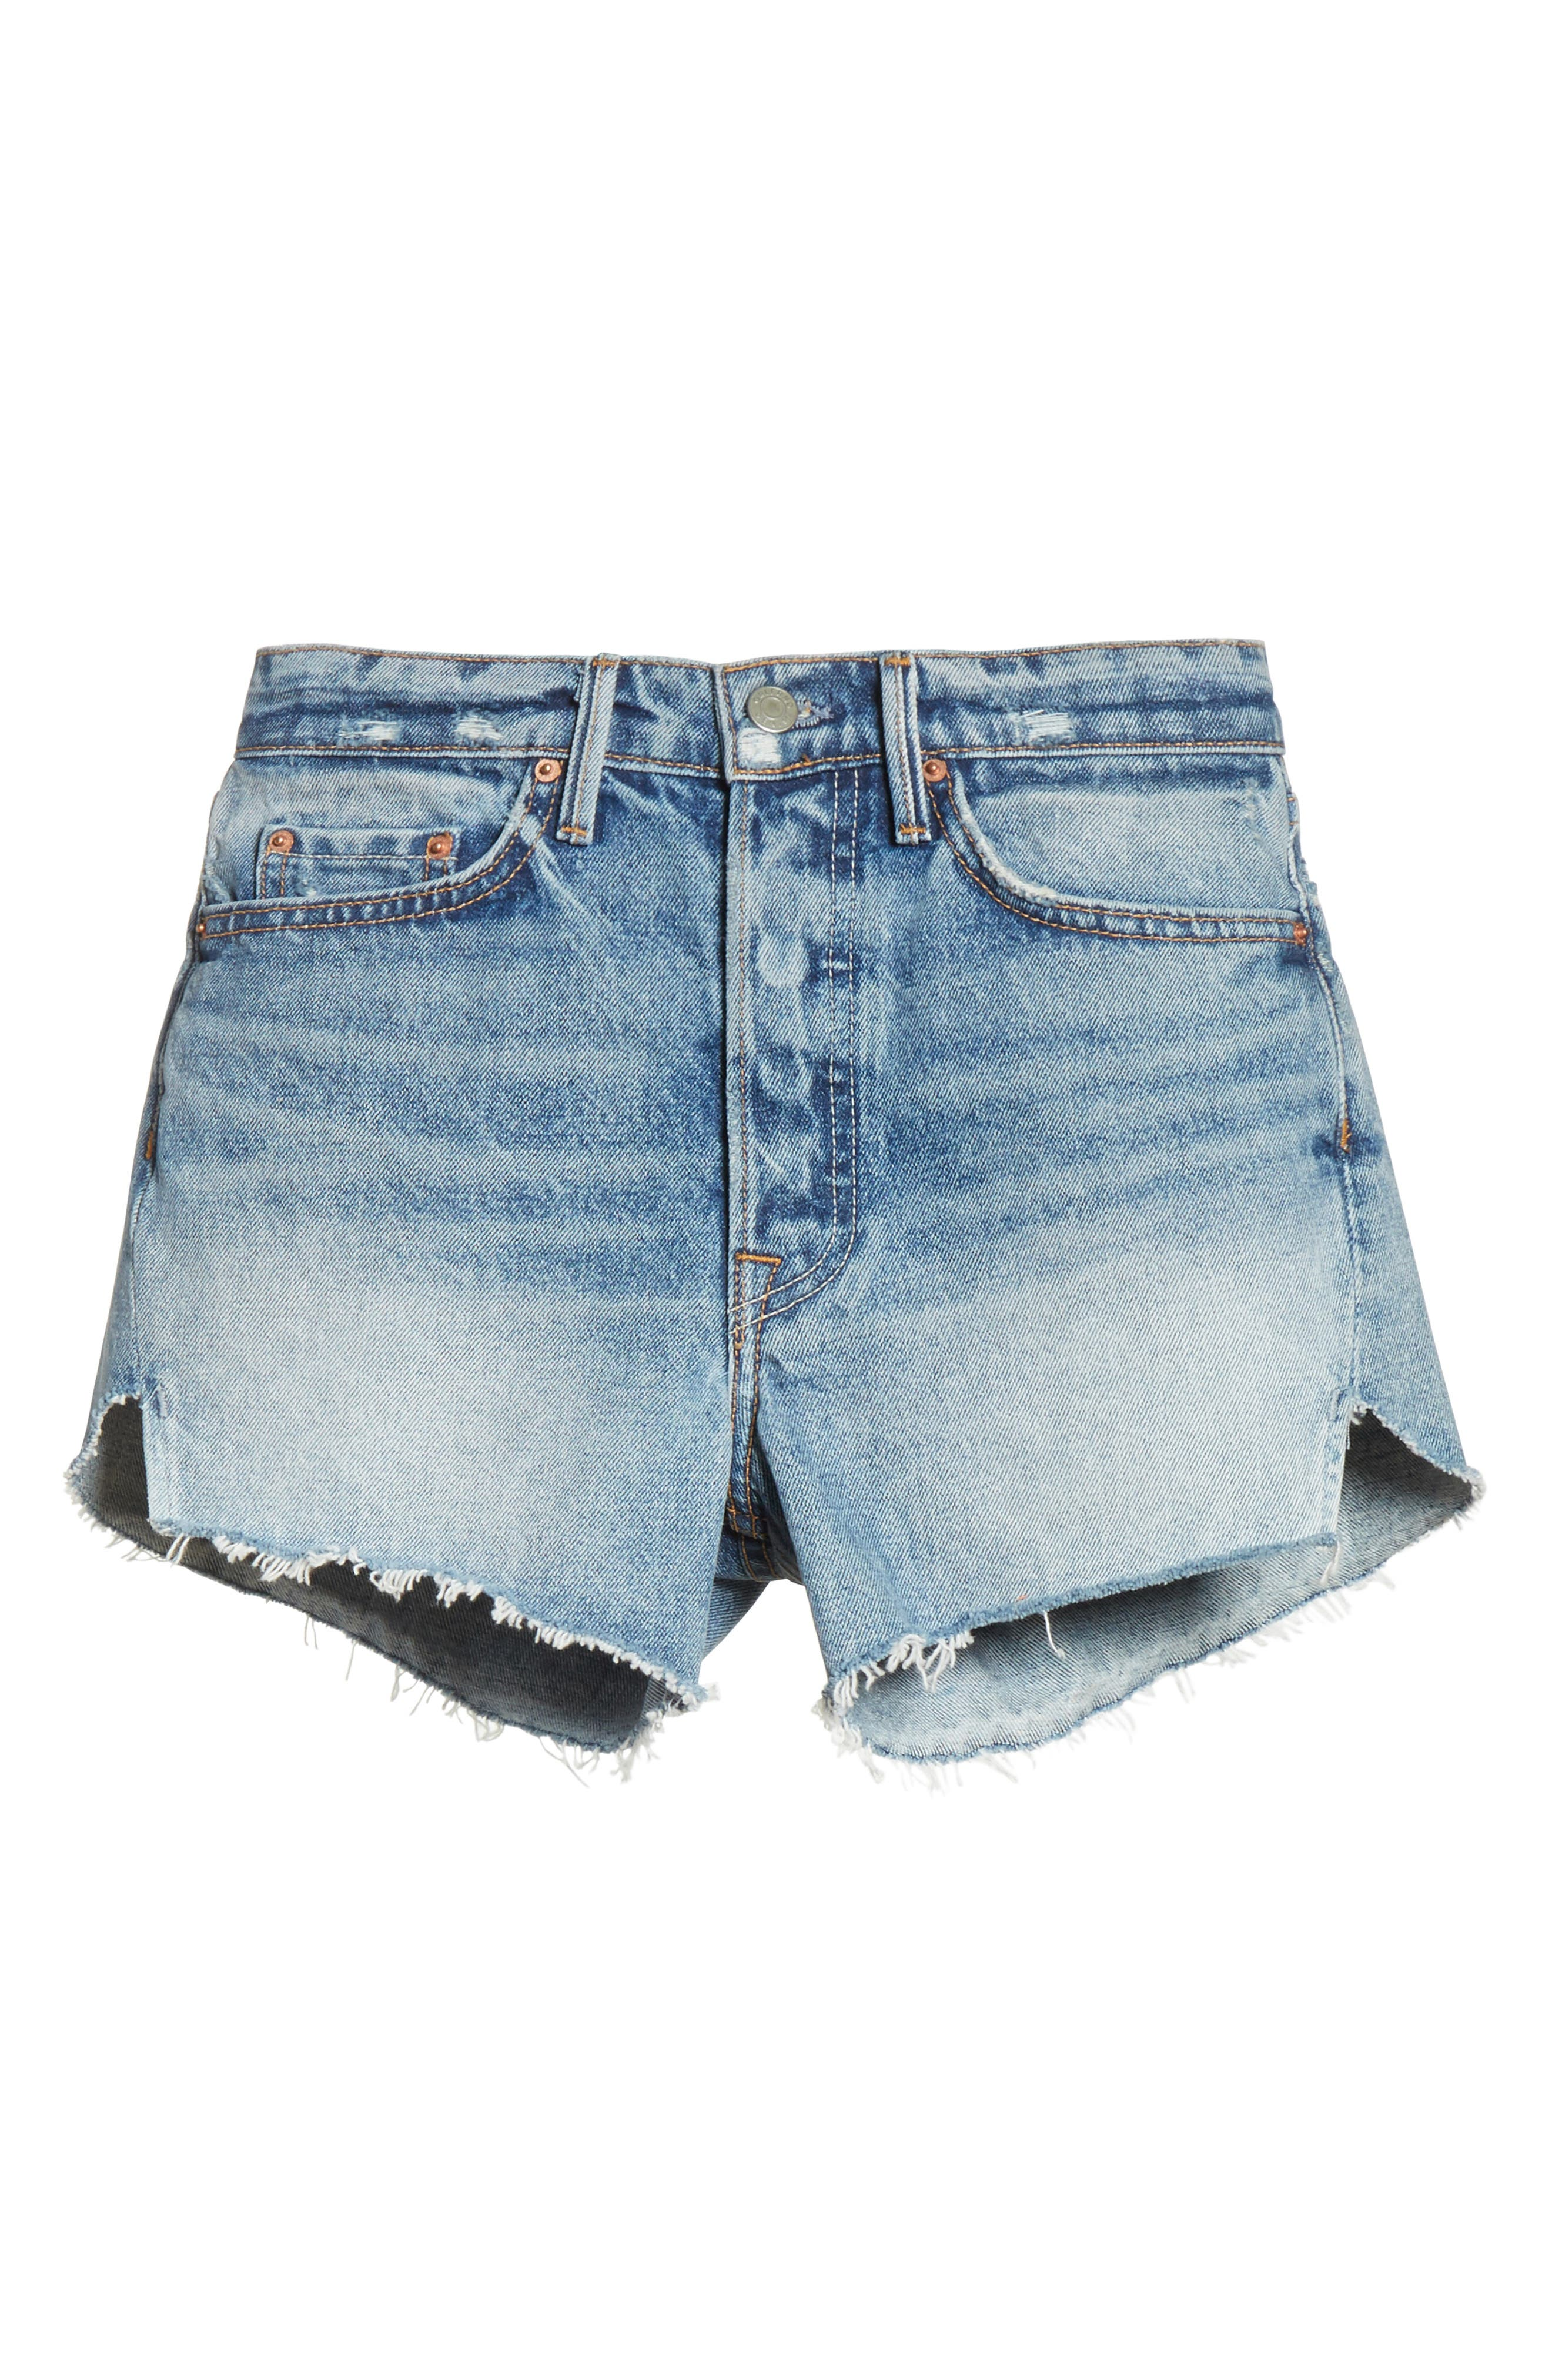 Mardee Denim Shorts,                             Alternate thumbnail 6, color,                             491